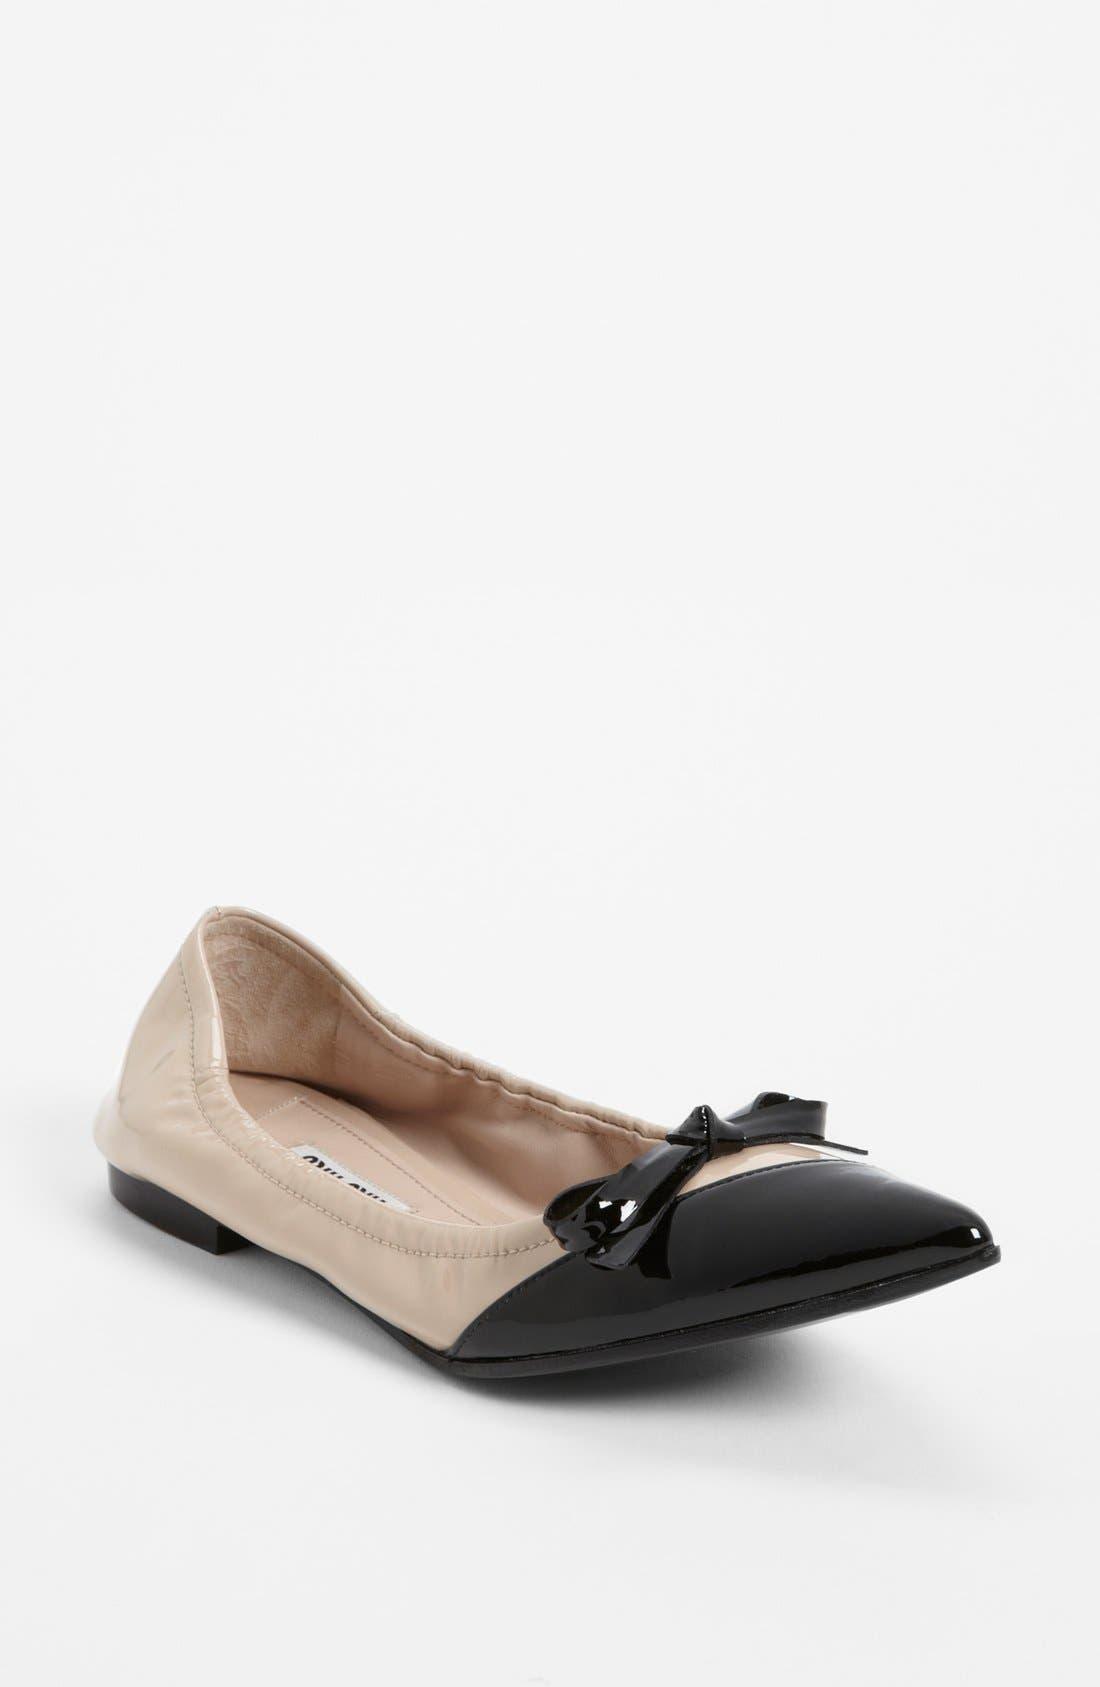 Alternate Image 1 Selected - Miu Miu Point Toe Ballet Flat